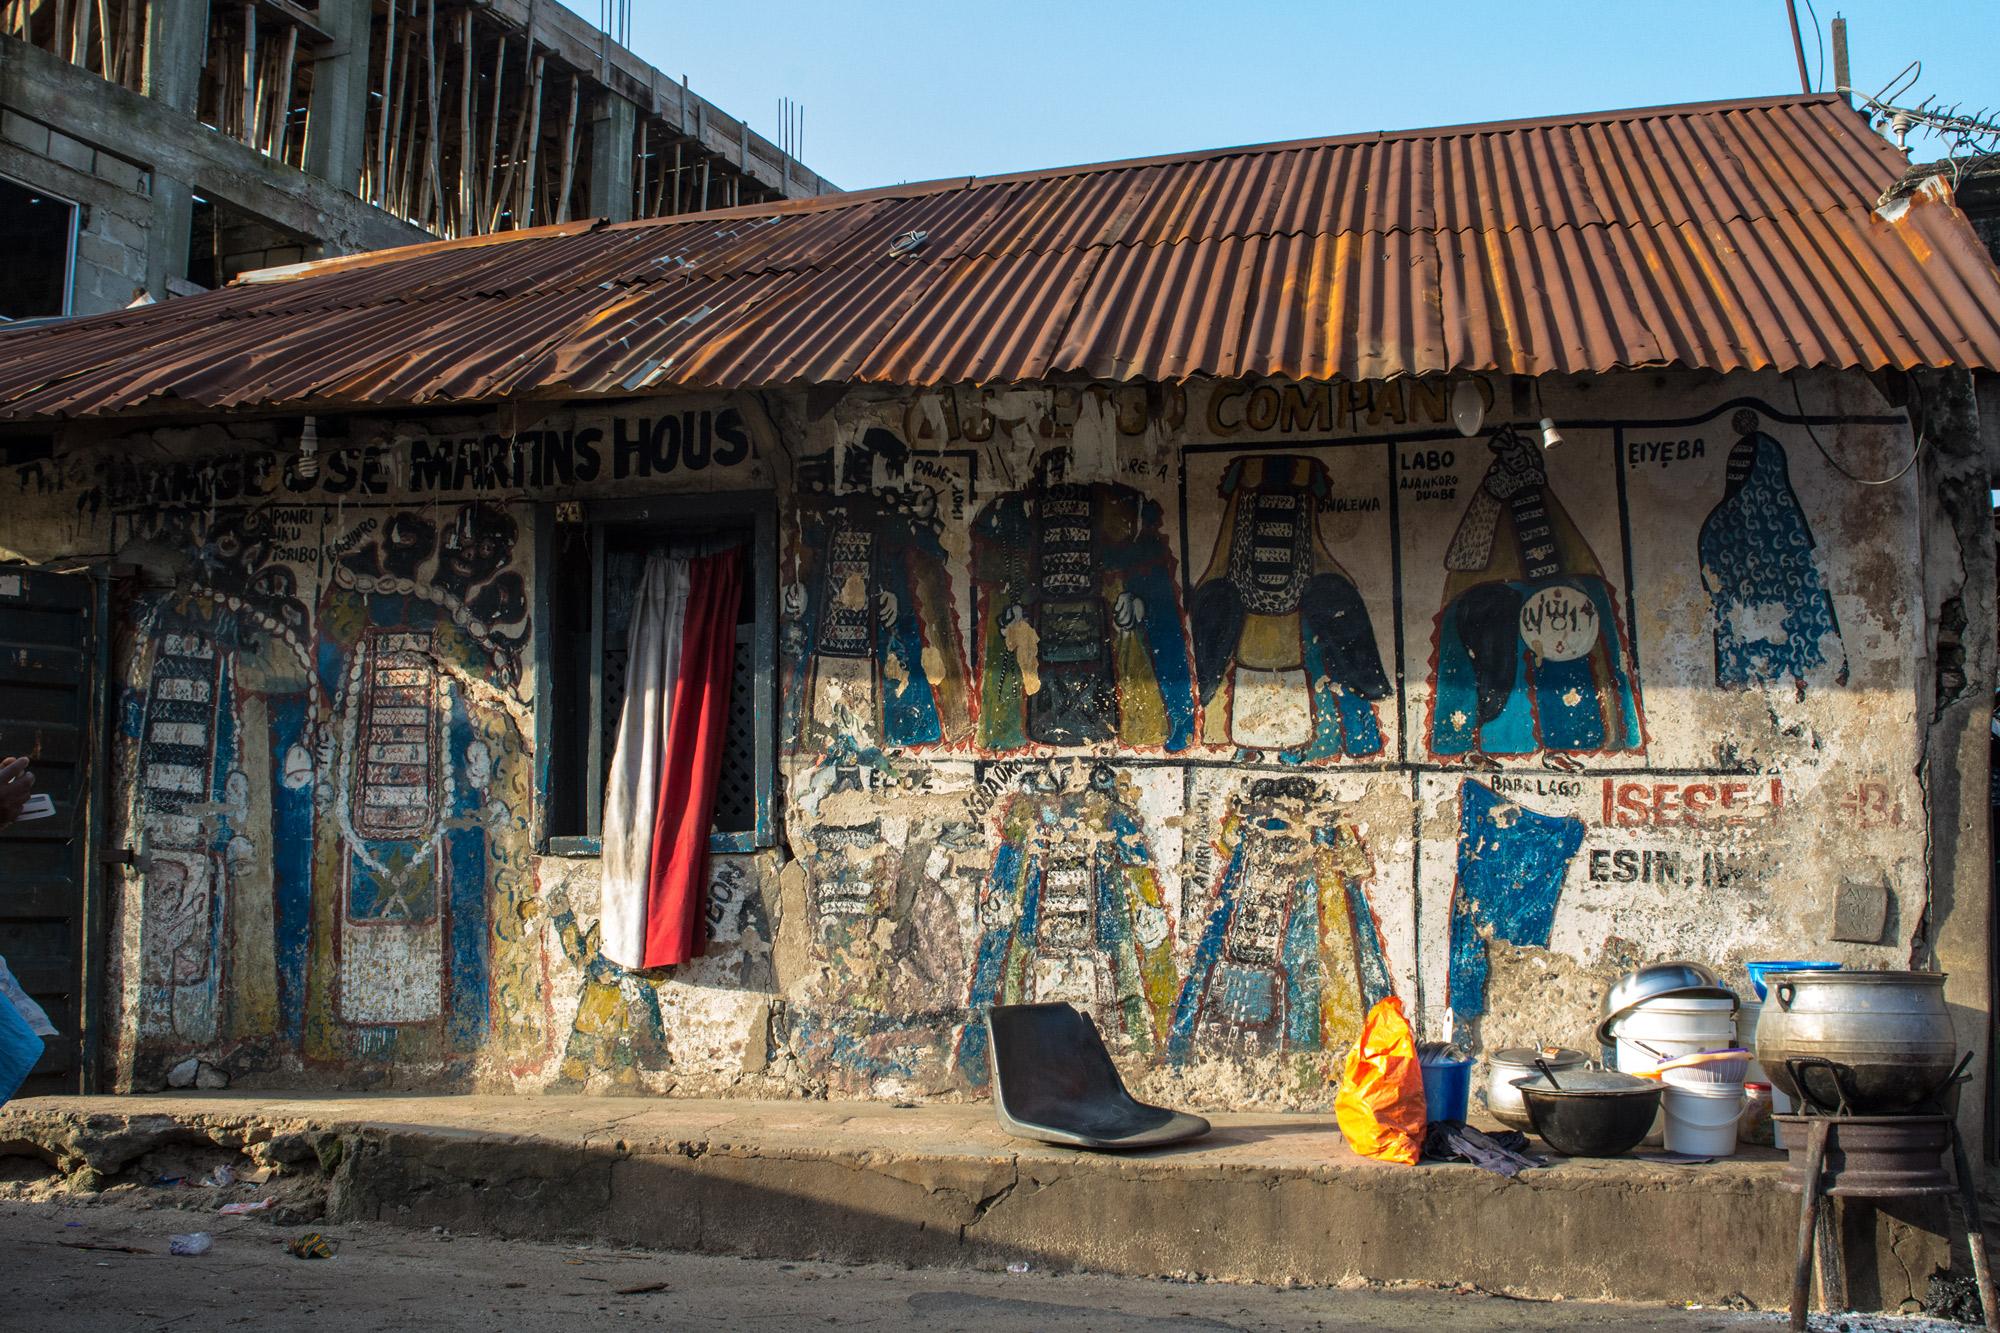 The Bamgboshe Martins House, home of a CandombléEgúngún from Brazil. ©Aderemi Adegbite